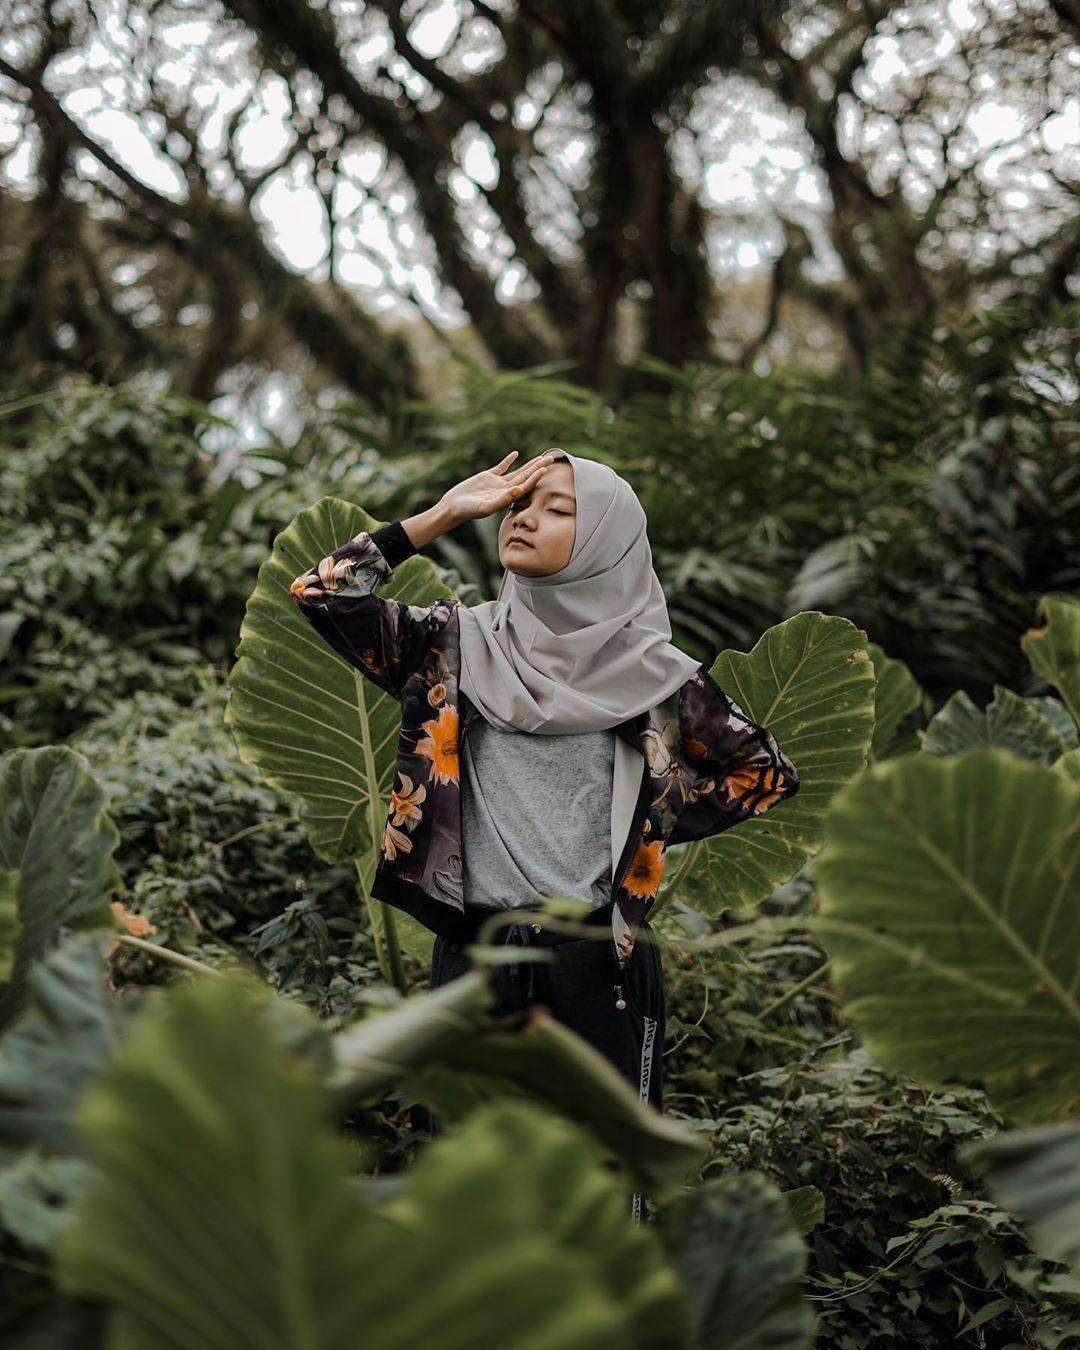 Djwatan Batang Pohon Hutan Tumbuhan Paku